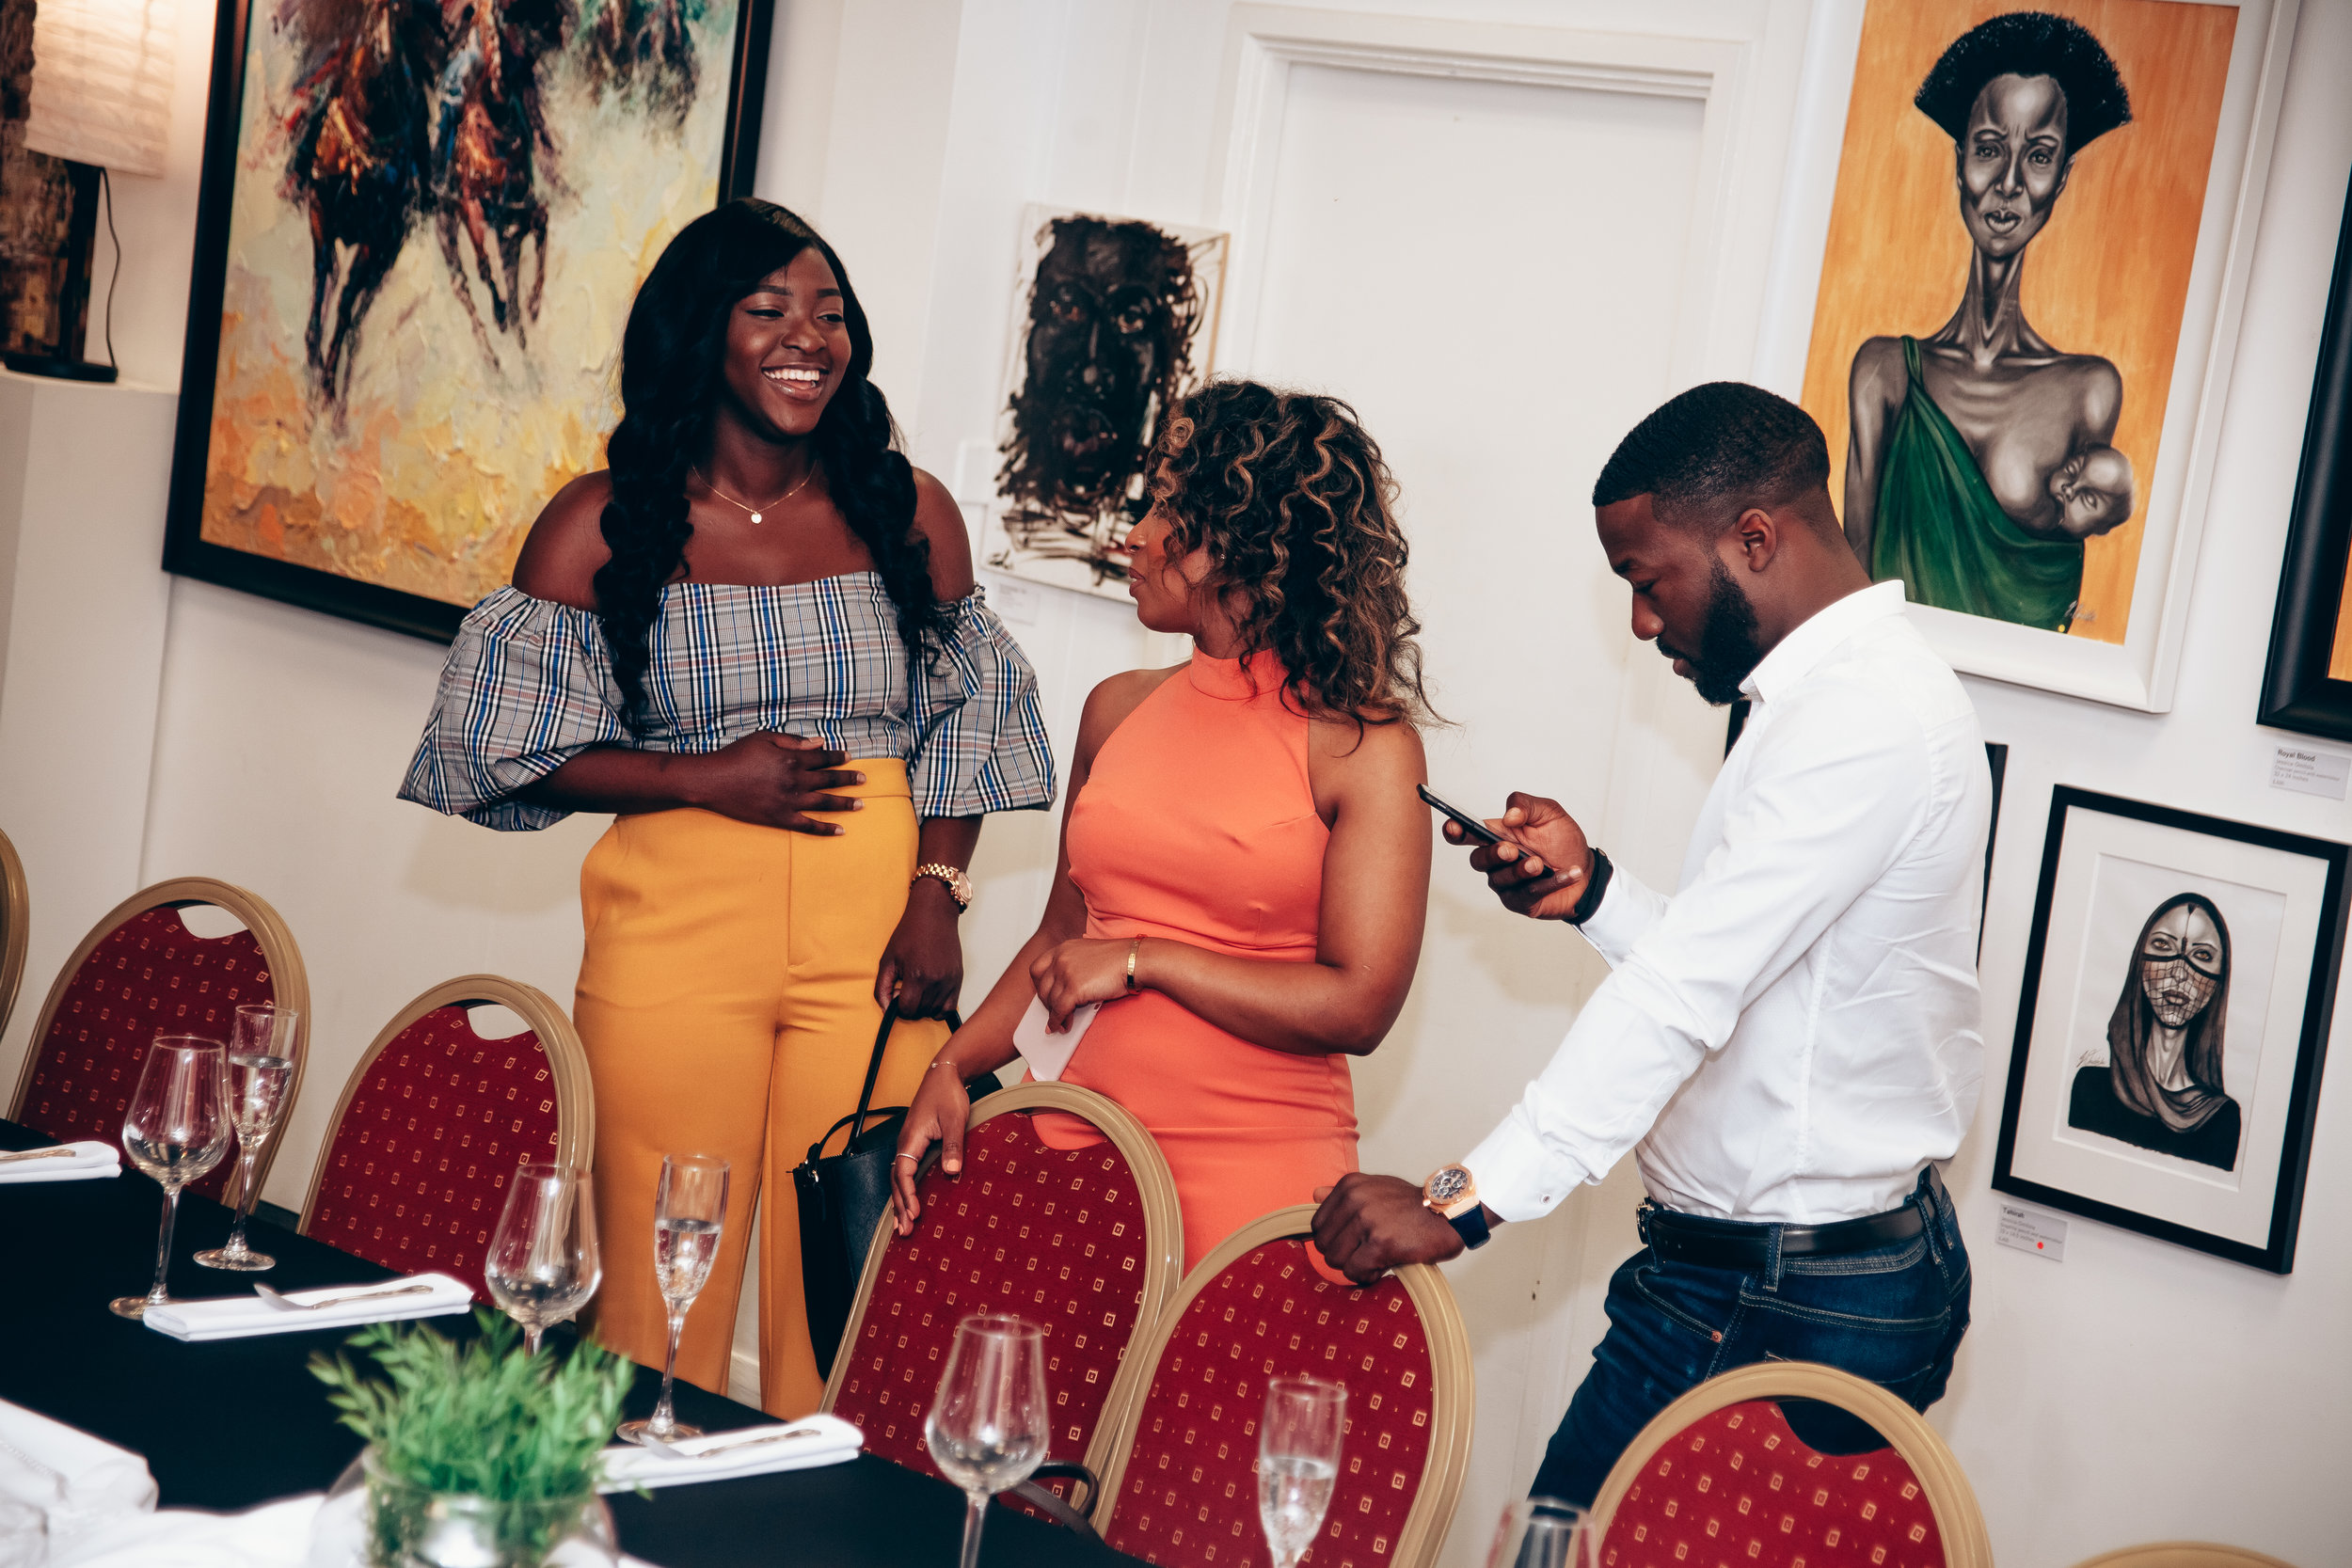 Red velvet by ookukoyi+manchester+based+British+Nigerian+author+entrepreneur+public+speaker_+mage+by+kenny